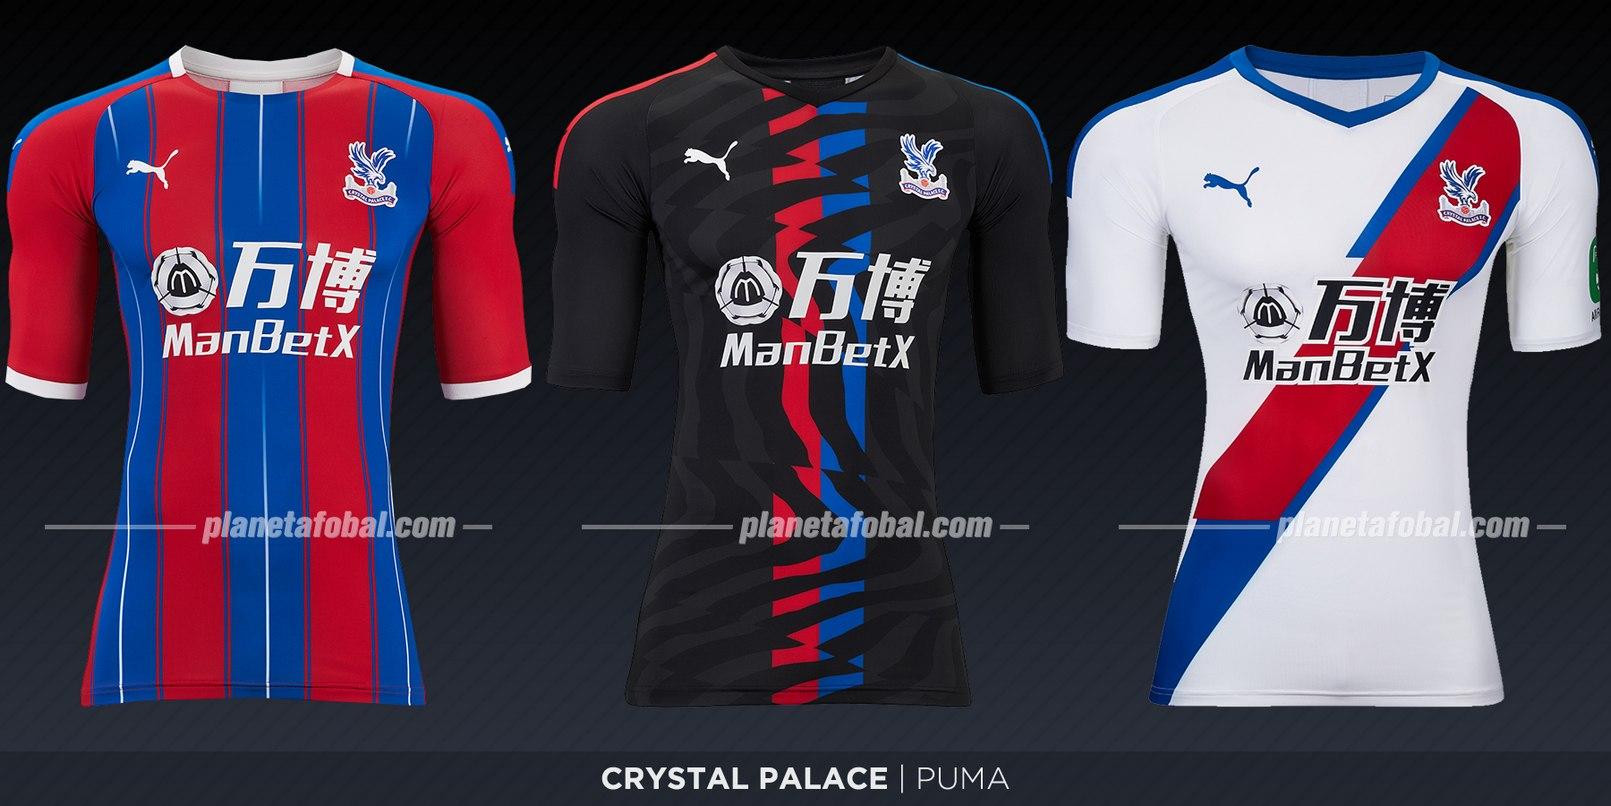 Crystal Palace (Puma) | Camisetas de la Premier League 2019-2020